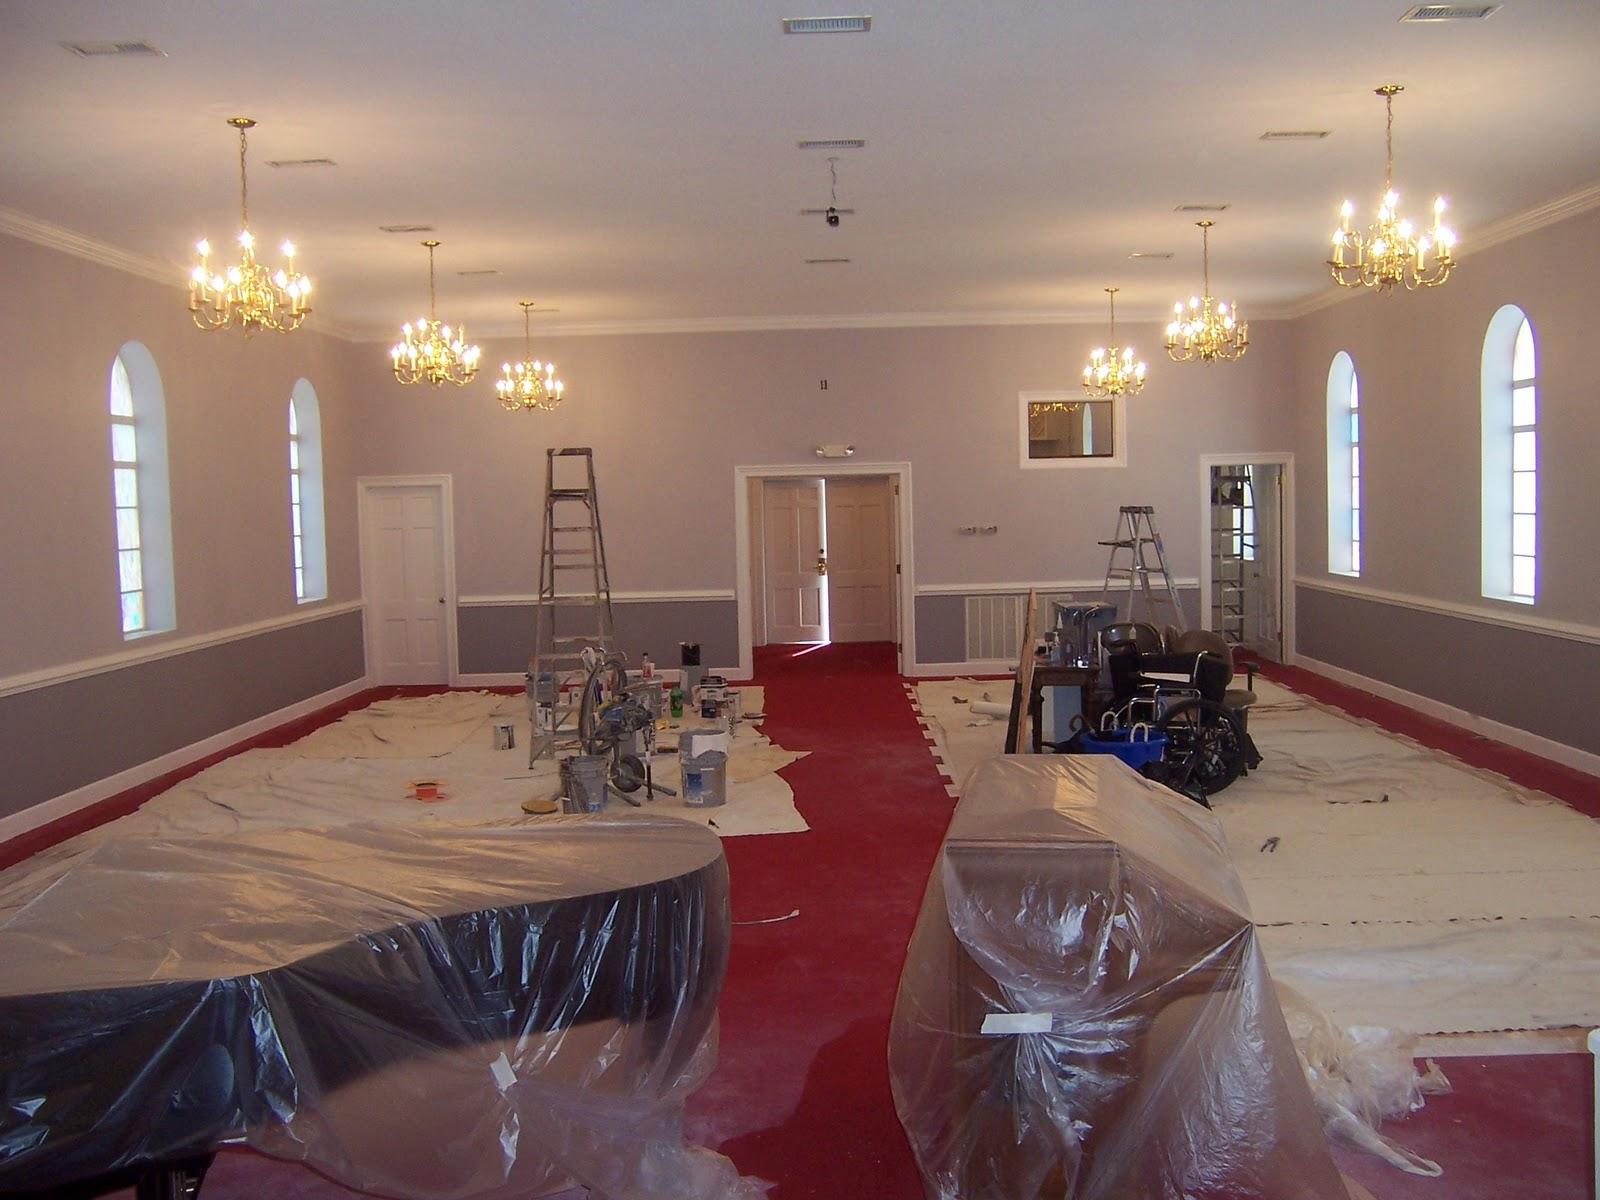 modern funeral home interior design best house design ideas - Small Church Sanctuary Design Ideas